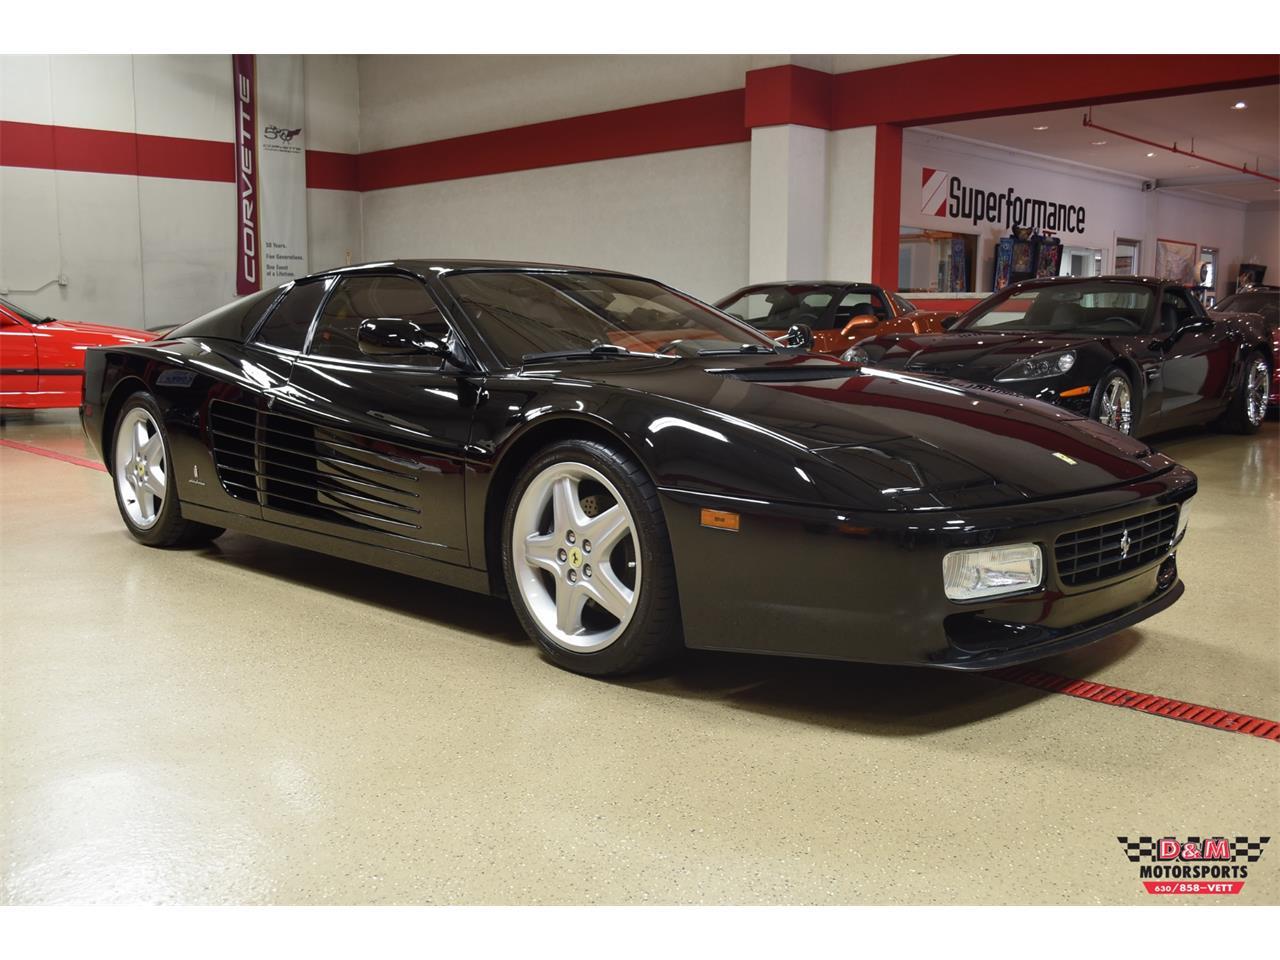 1992 Ferrari Testarossa (CC-1241416) for sale in Glen Ellyn, Illinois